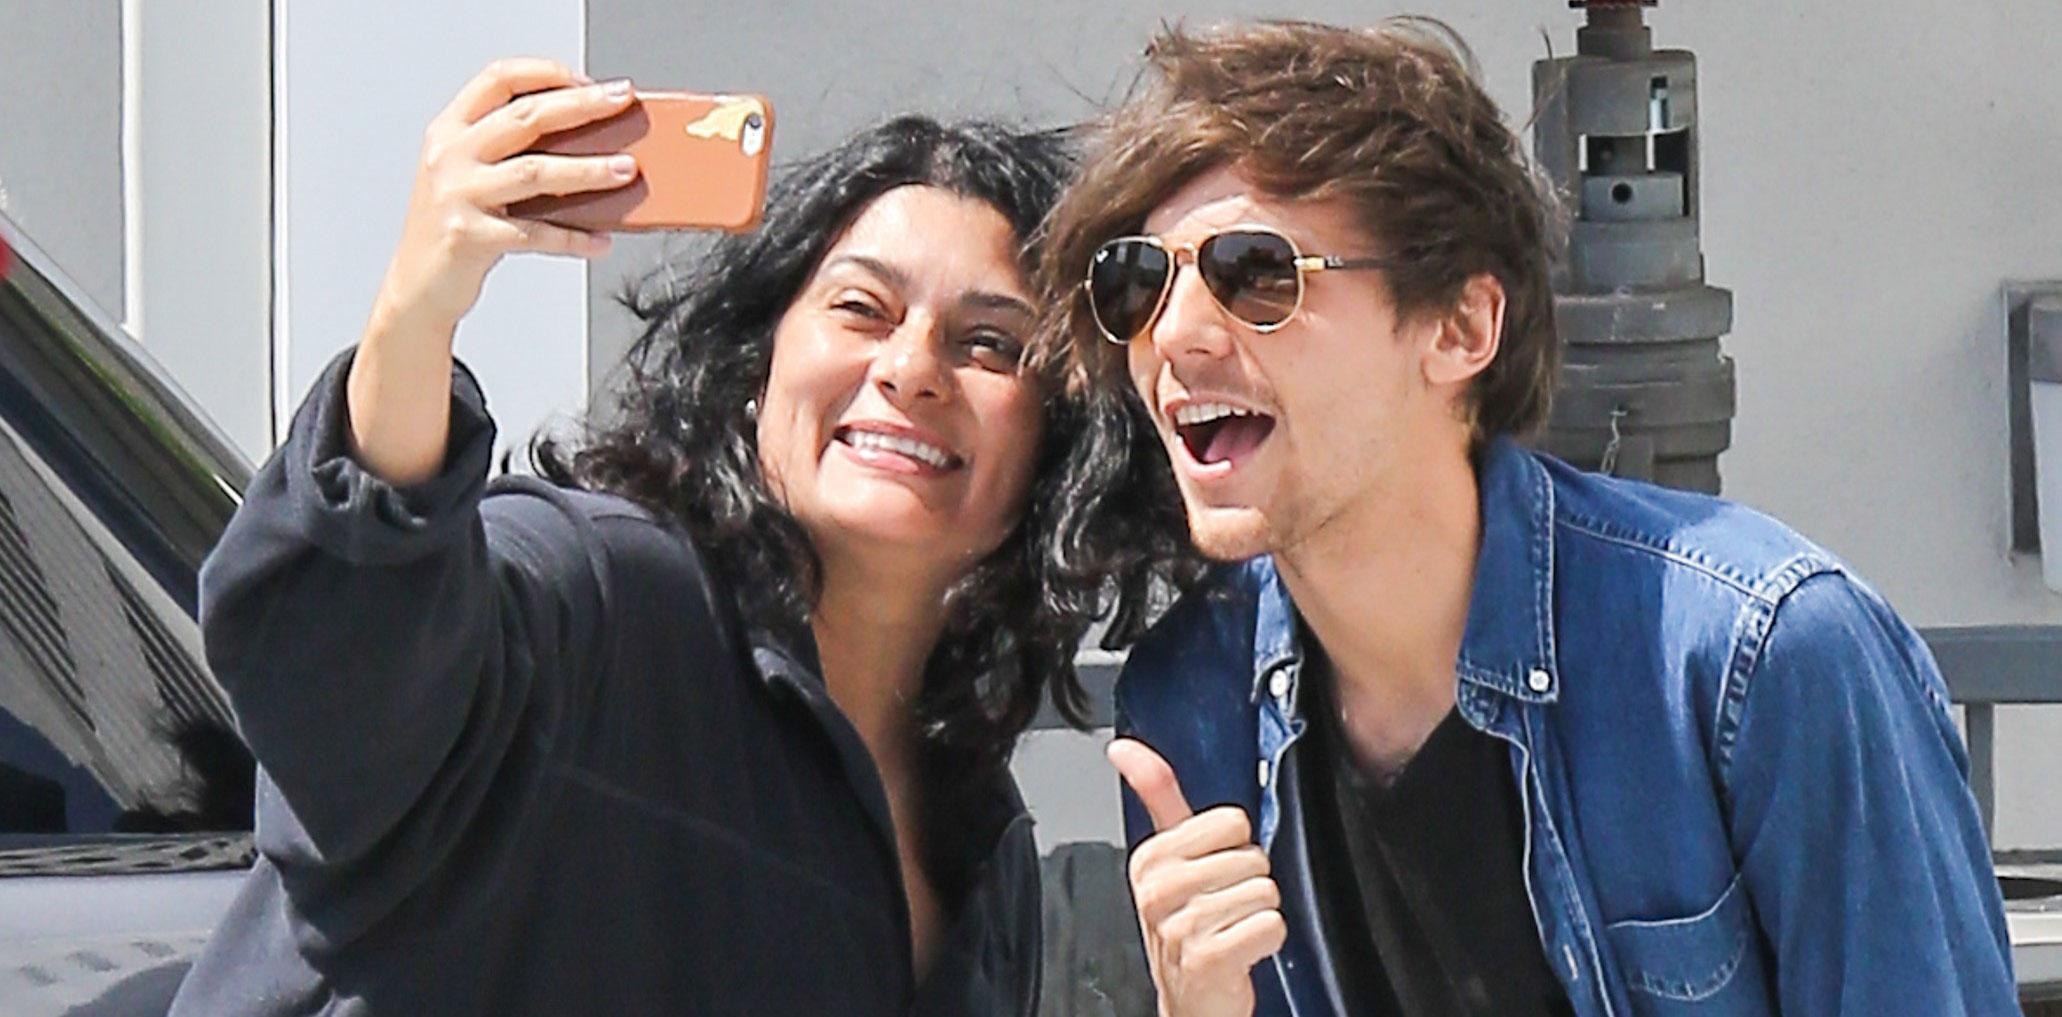 Louis Tomlinson Sisters Update: Louis Tomlinson Takes Fan Selfies While Outside Starbucks